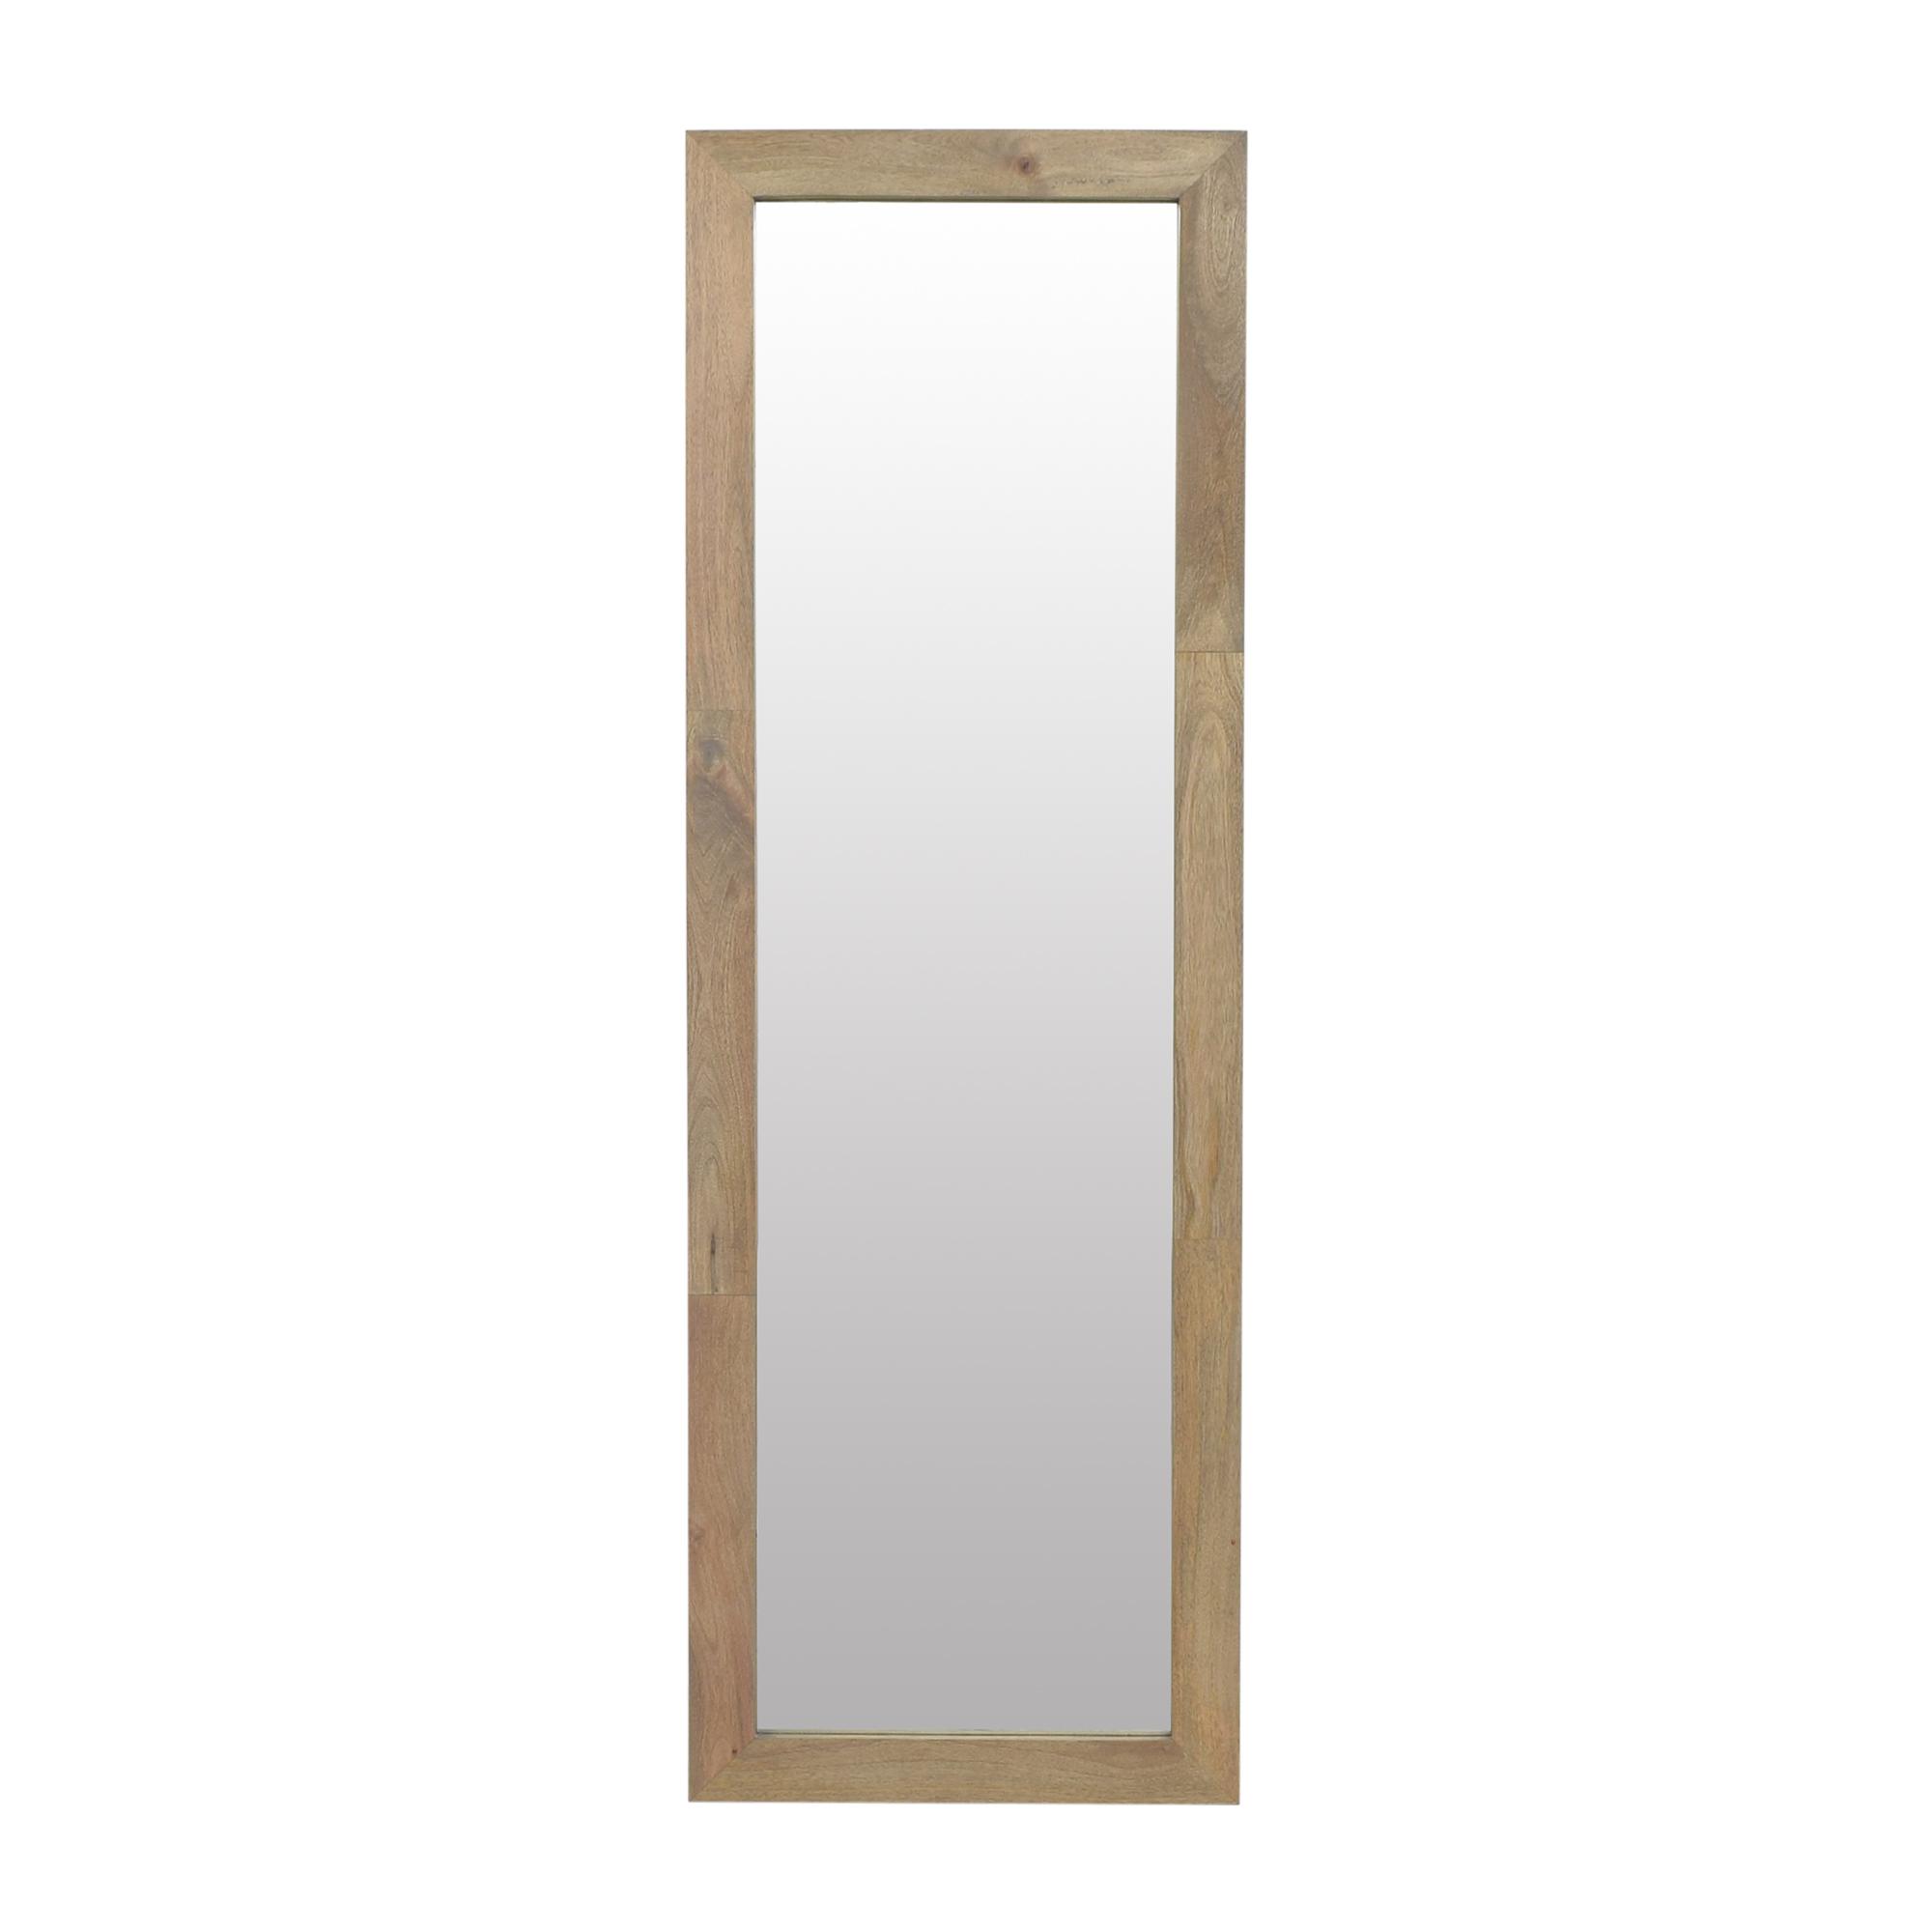 West Elm Framed Floor Mirror / Mirrors